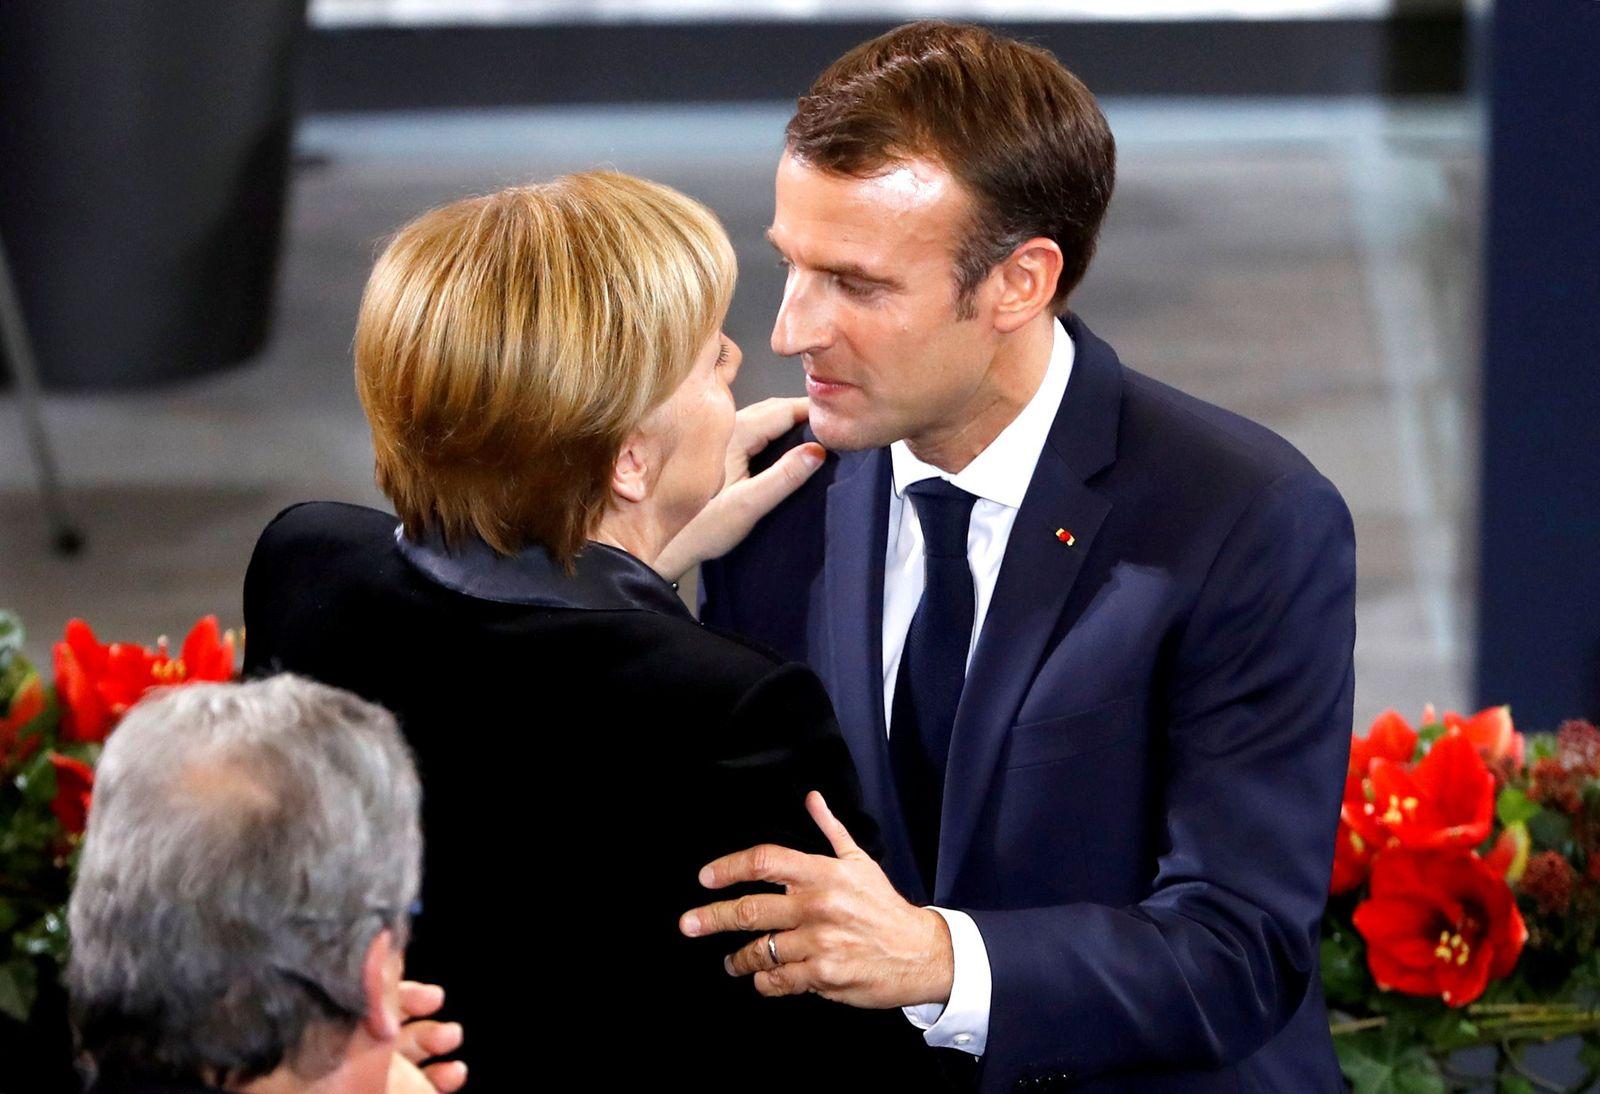 GERMANY-FRANCE/MACRON-BUNDESTAG